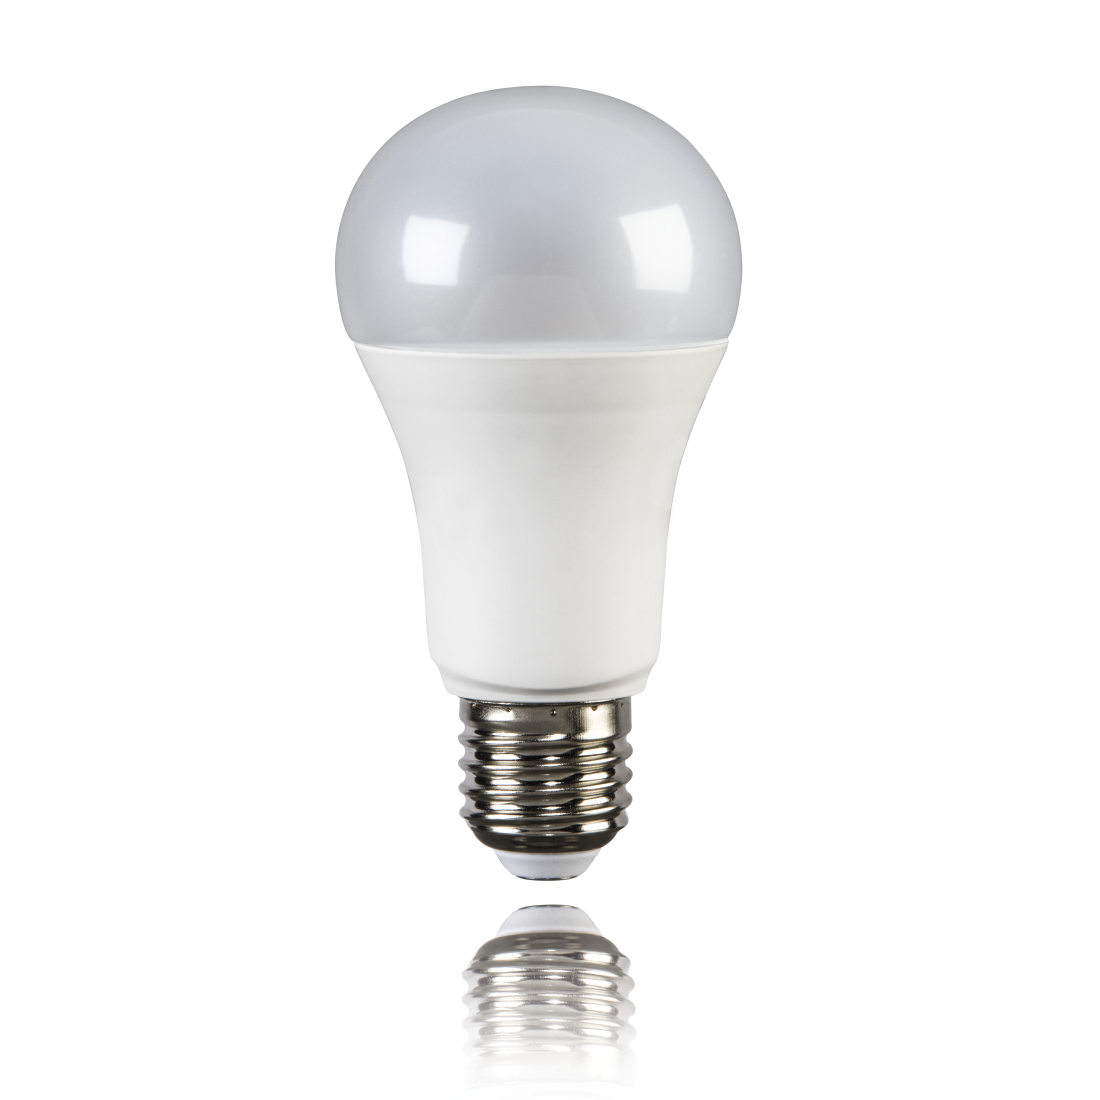 xavax.eu | 00112240 Xavax LED-Lampe, E27, 1521lm ersetzt 100W ...